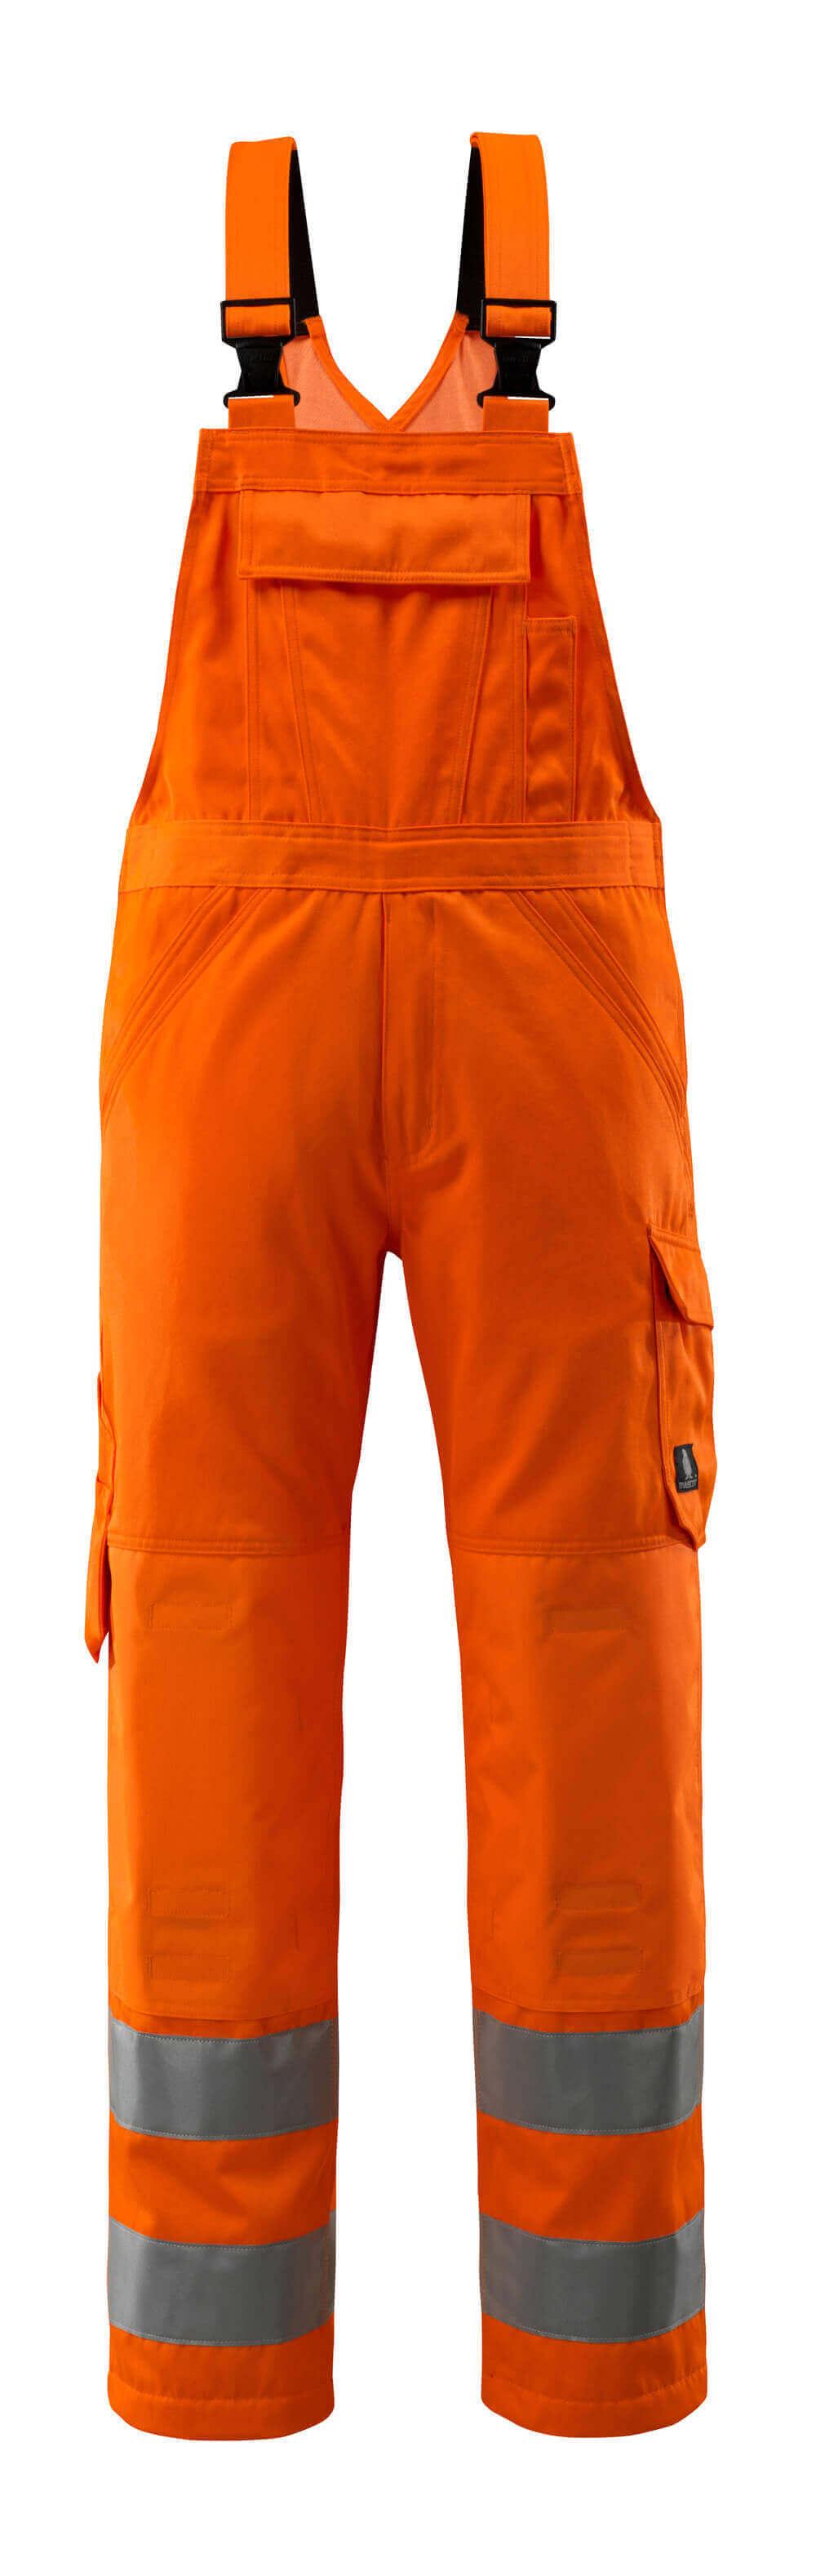 16869-860-14 Peto con bolsillos para rodilleras - naranja de alta vis.